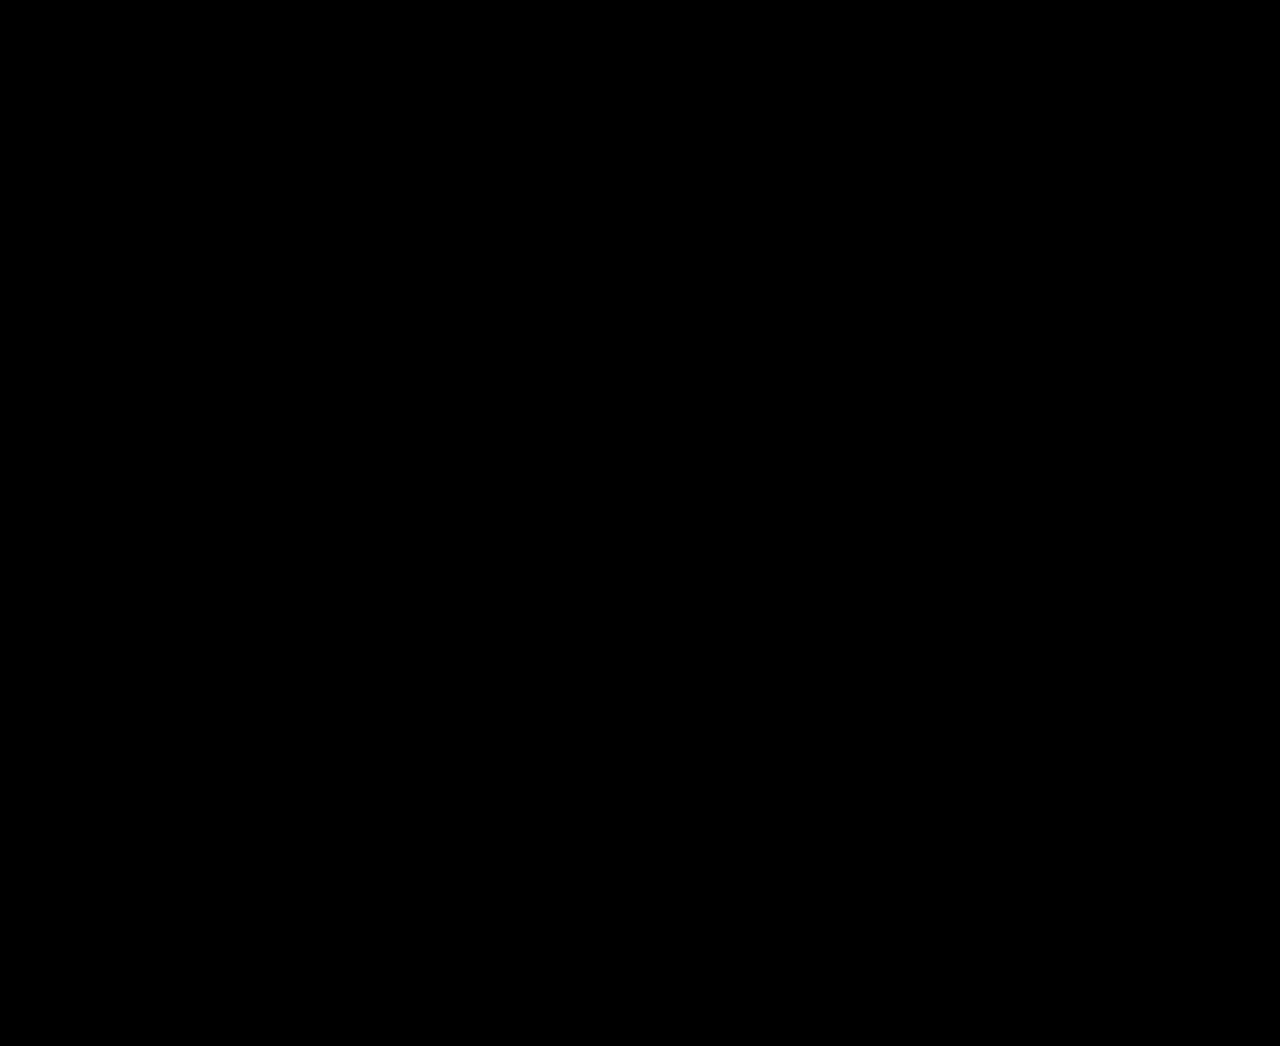 sihouette